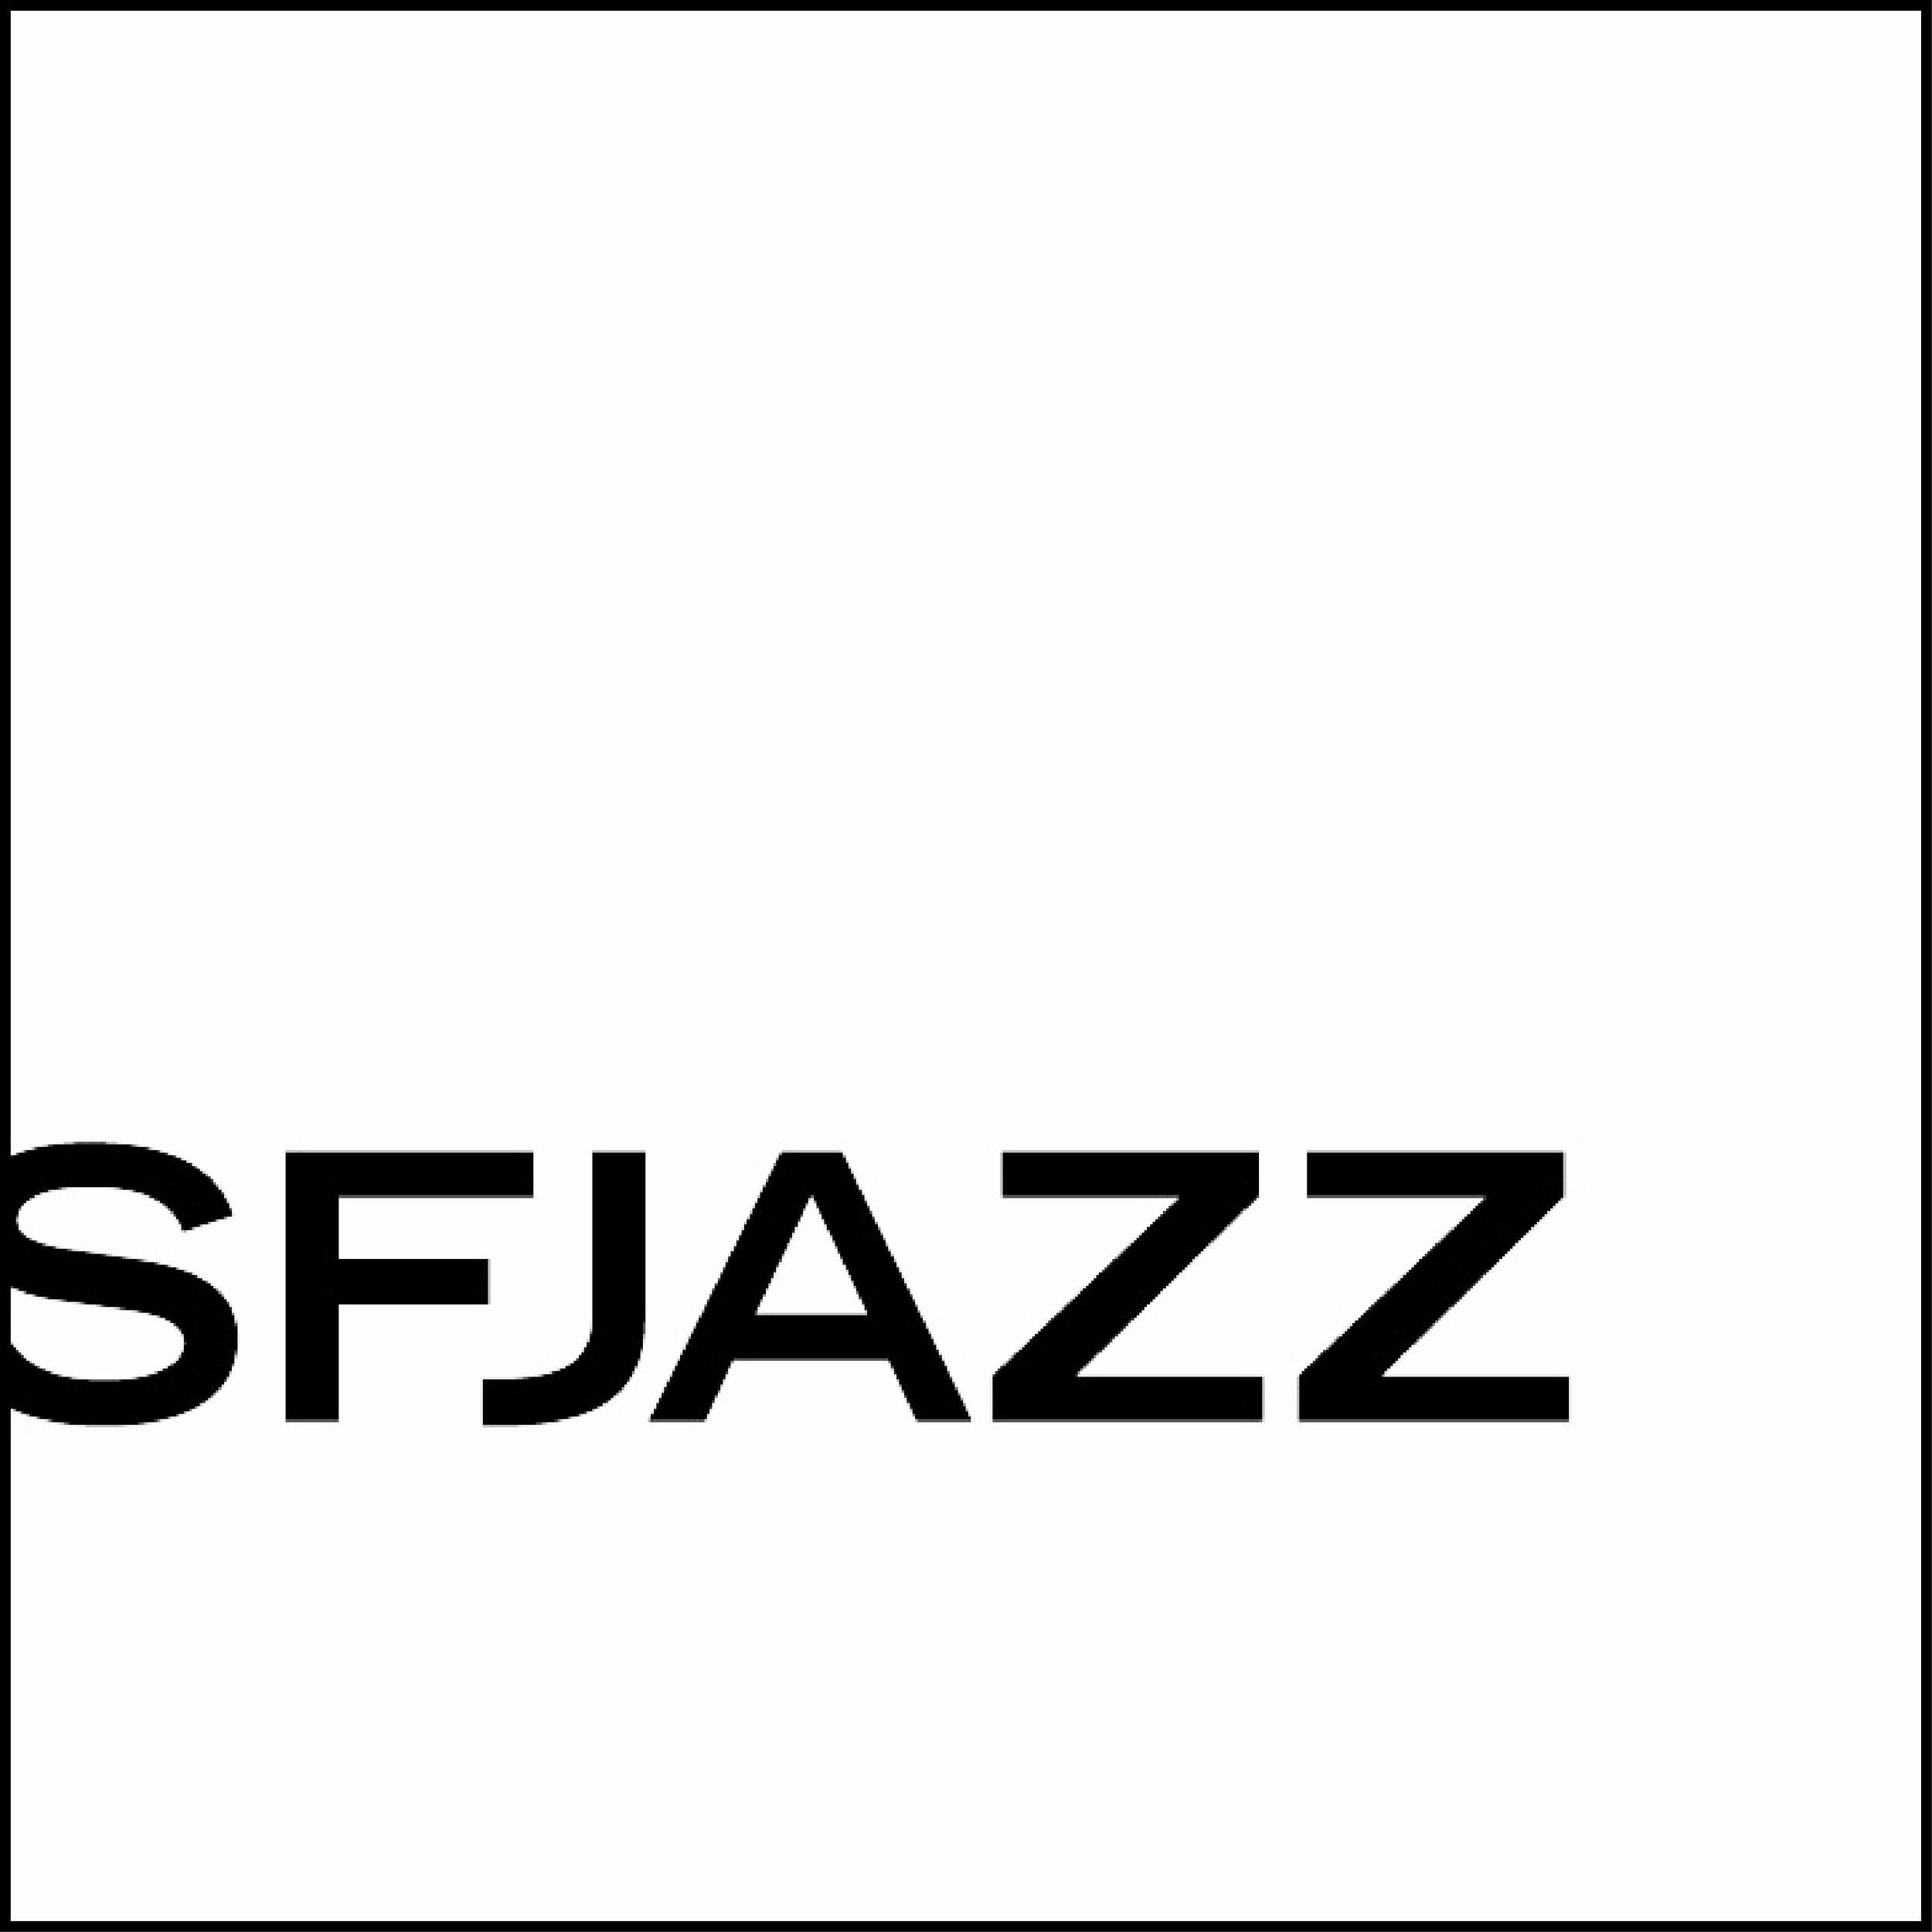 sfjazz_logo_white_boarder.jpg